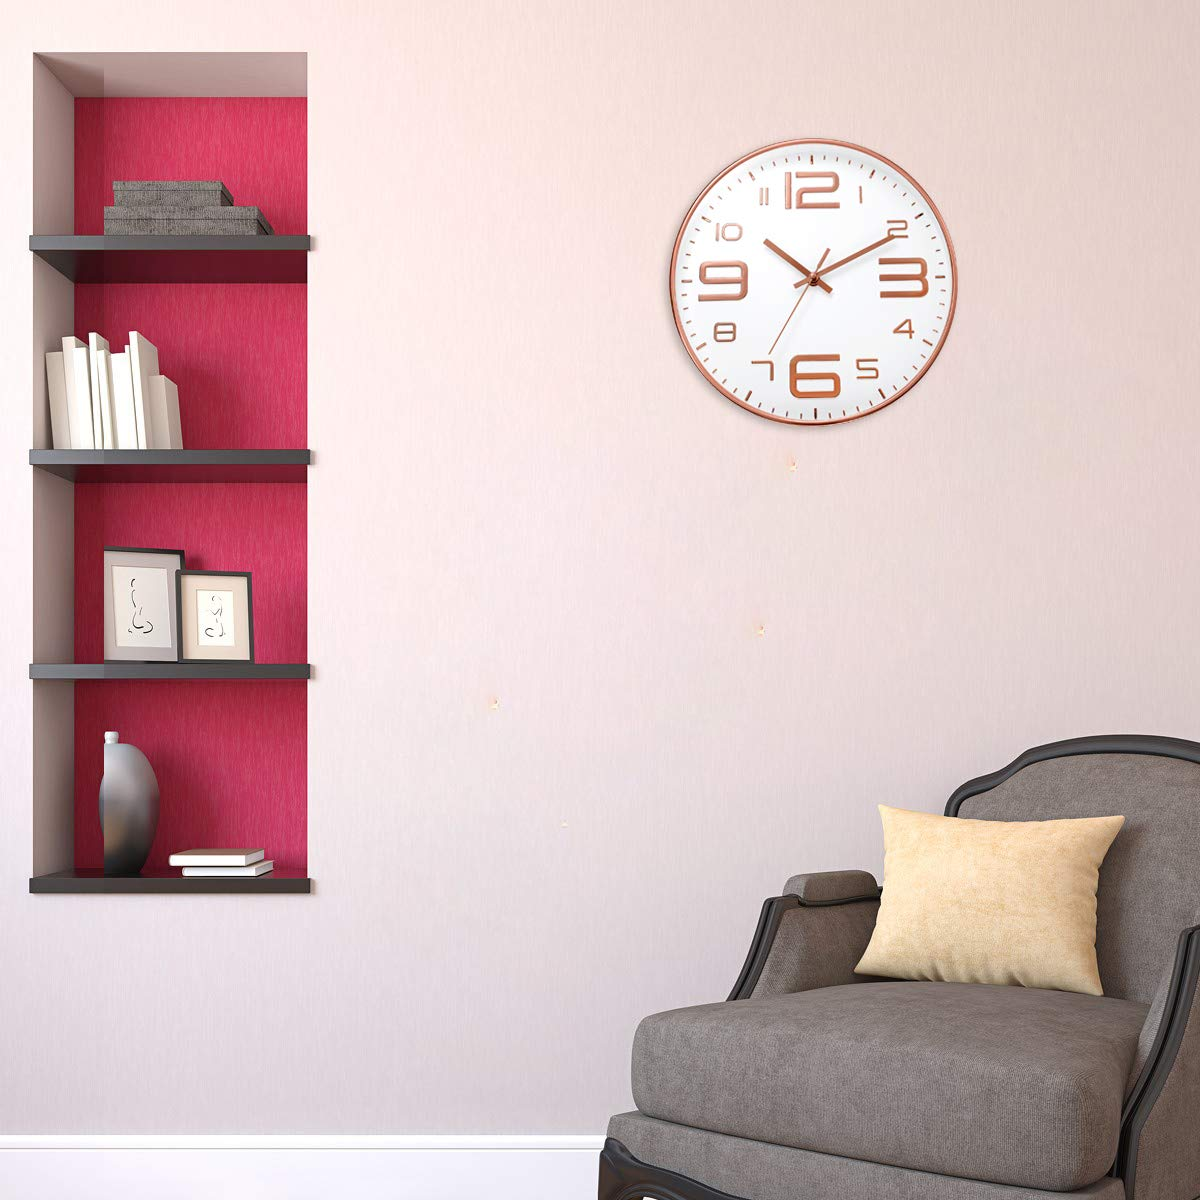 ufengke Reloj de Pared Numeros 3D Industrial Oro Rosa Reloj Quartz Silencioso Ultramodernos Pare Salon Comedor, Diámetro 30cm